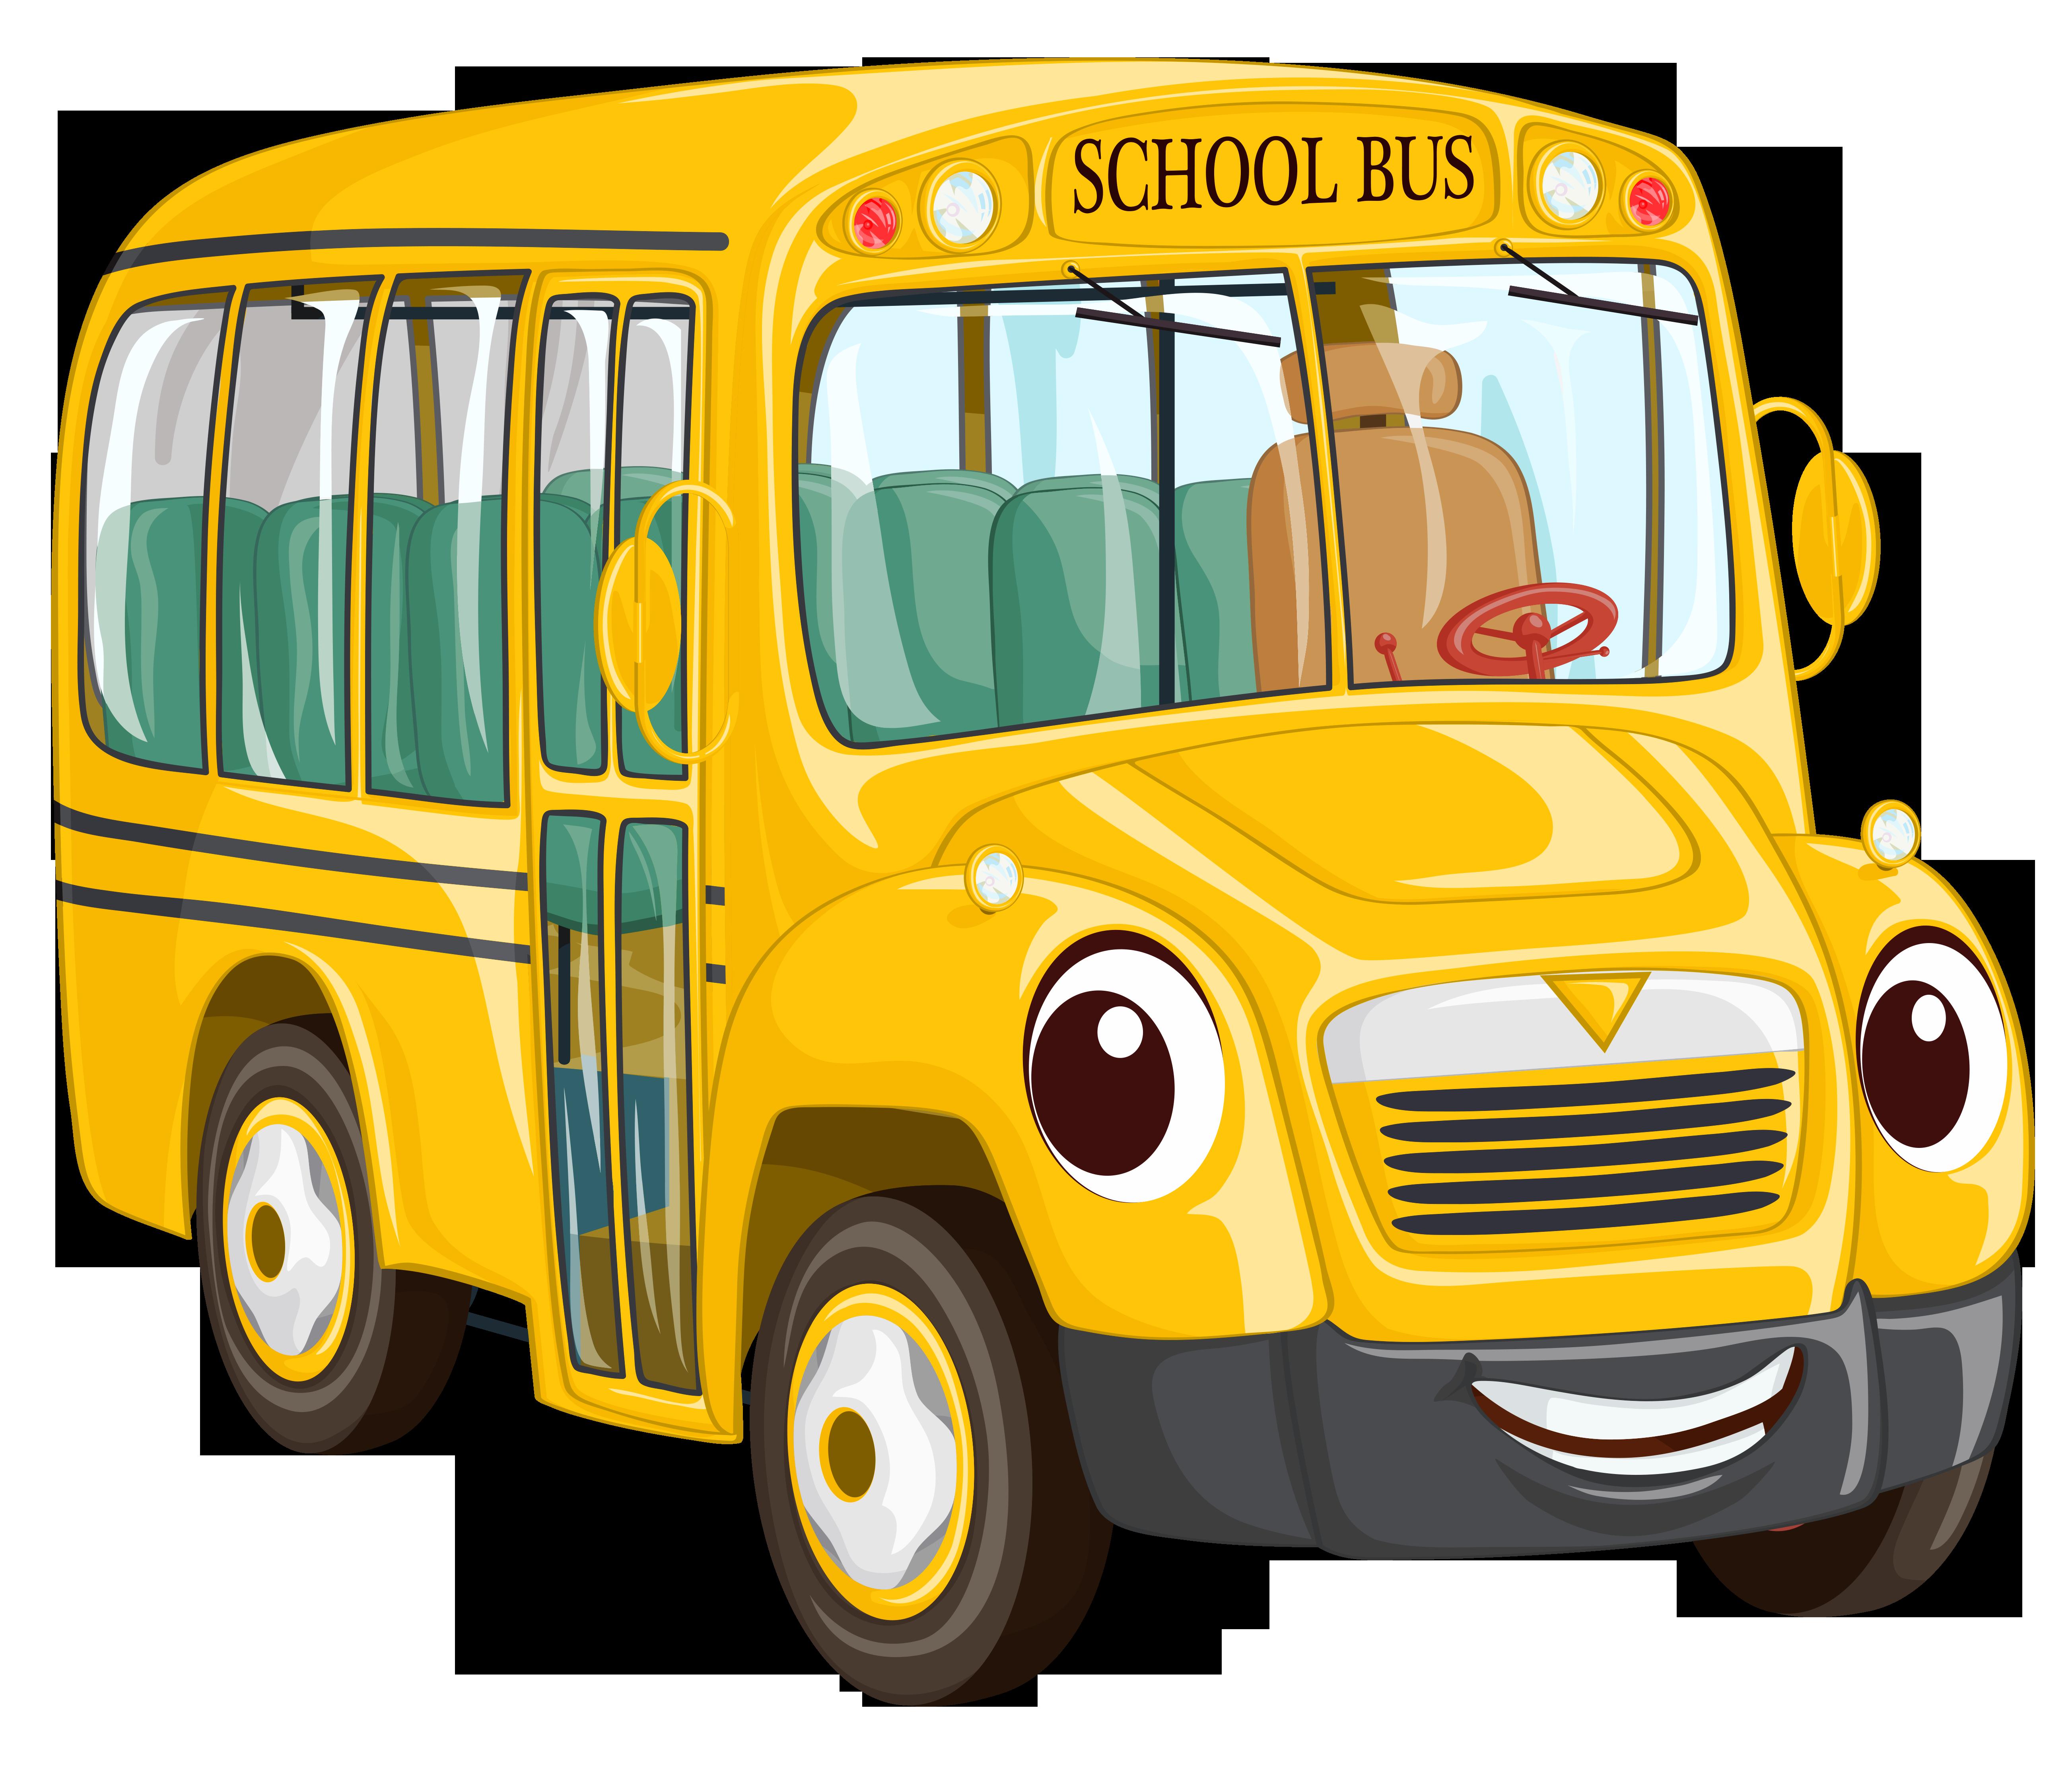 5210x4440 School Bus Png Clipart Imageu200b Gallery Yopriceville